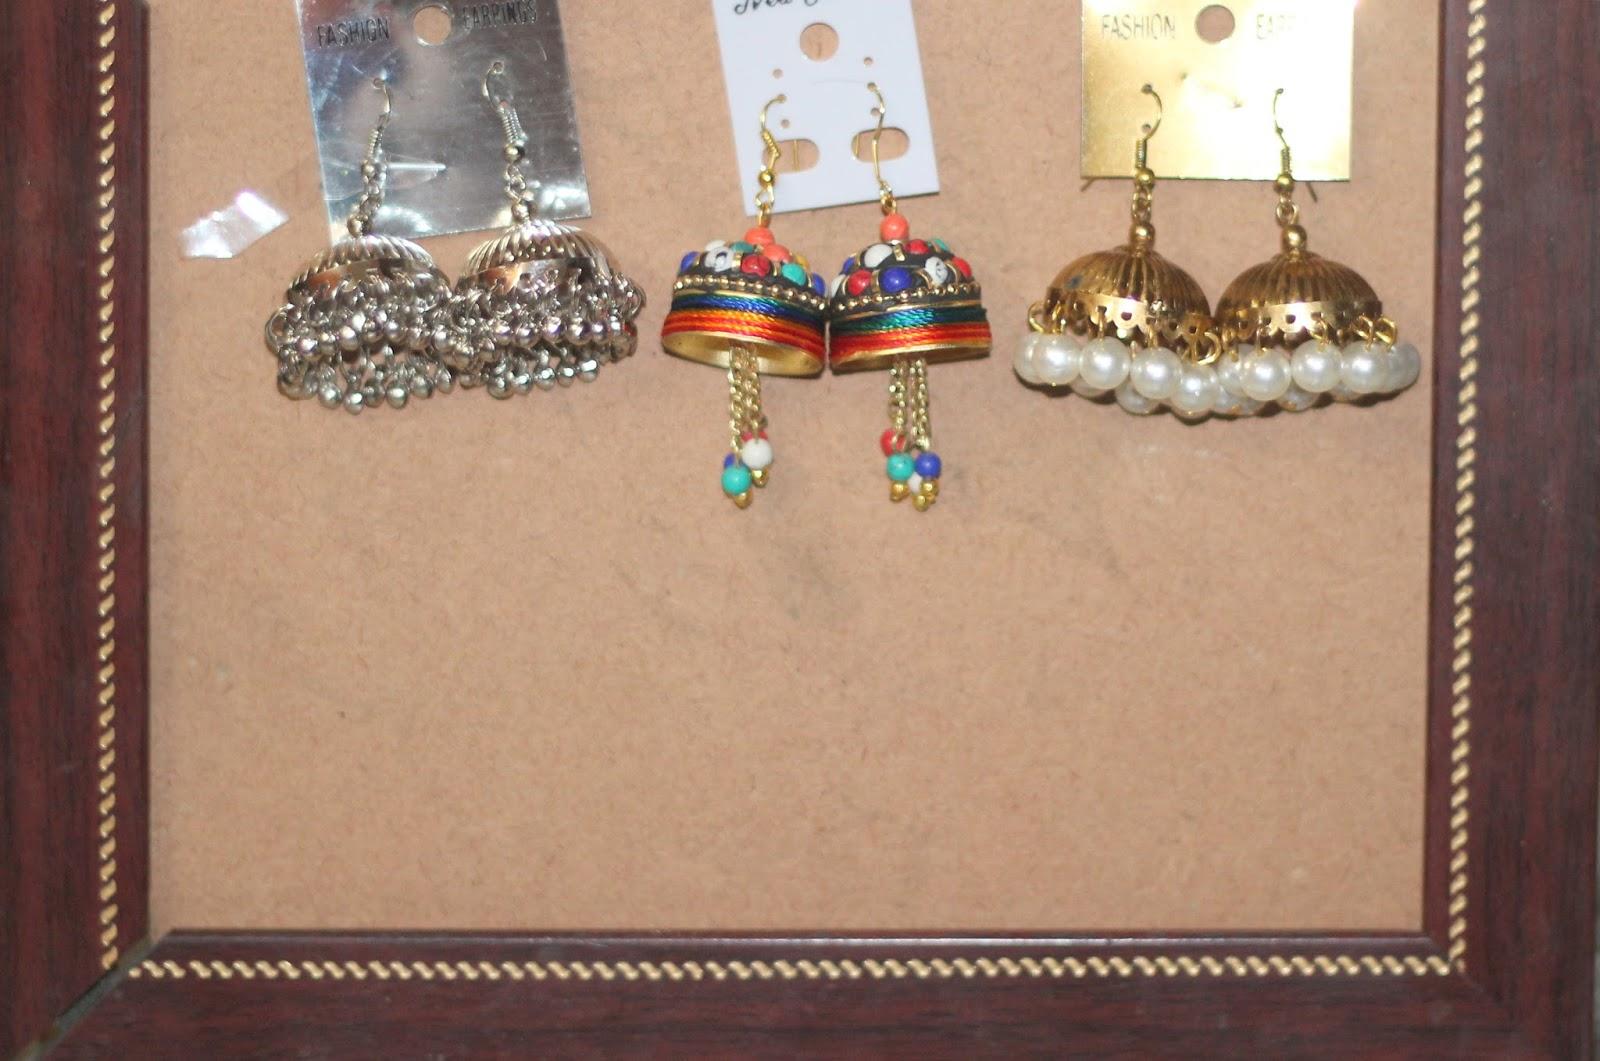 e8199d2d7aa Jhumkas and More from Sarojini Nagar - Shopping